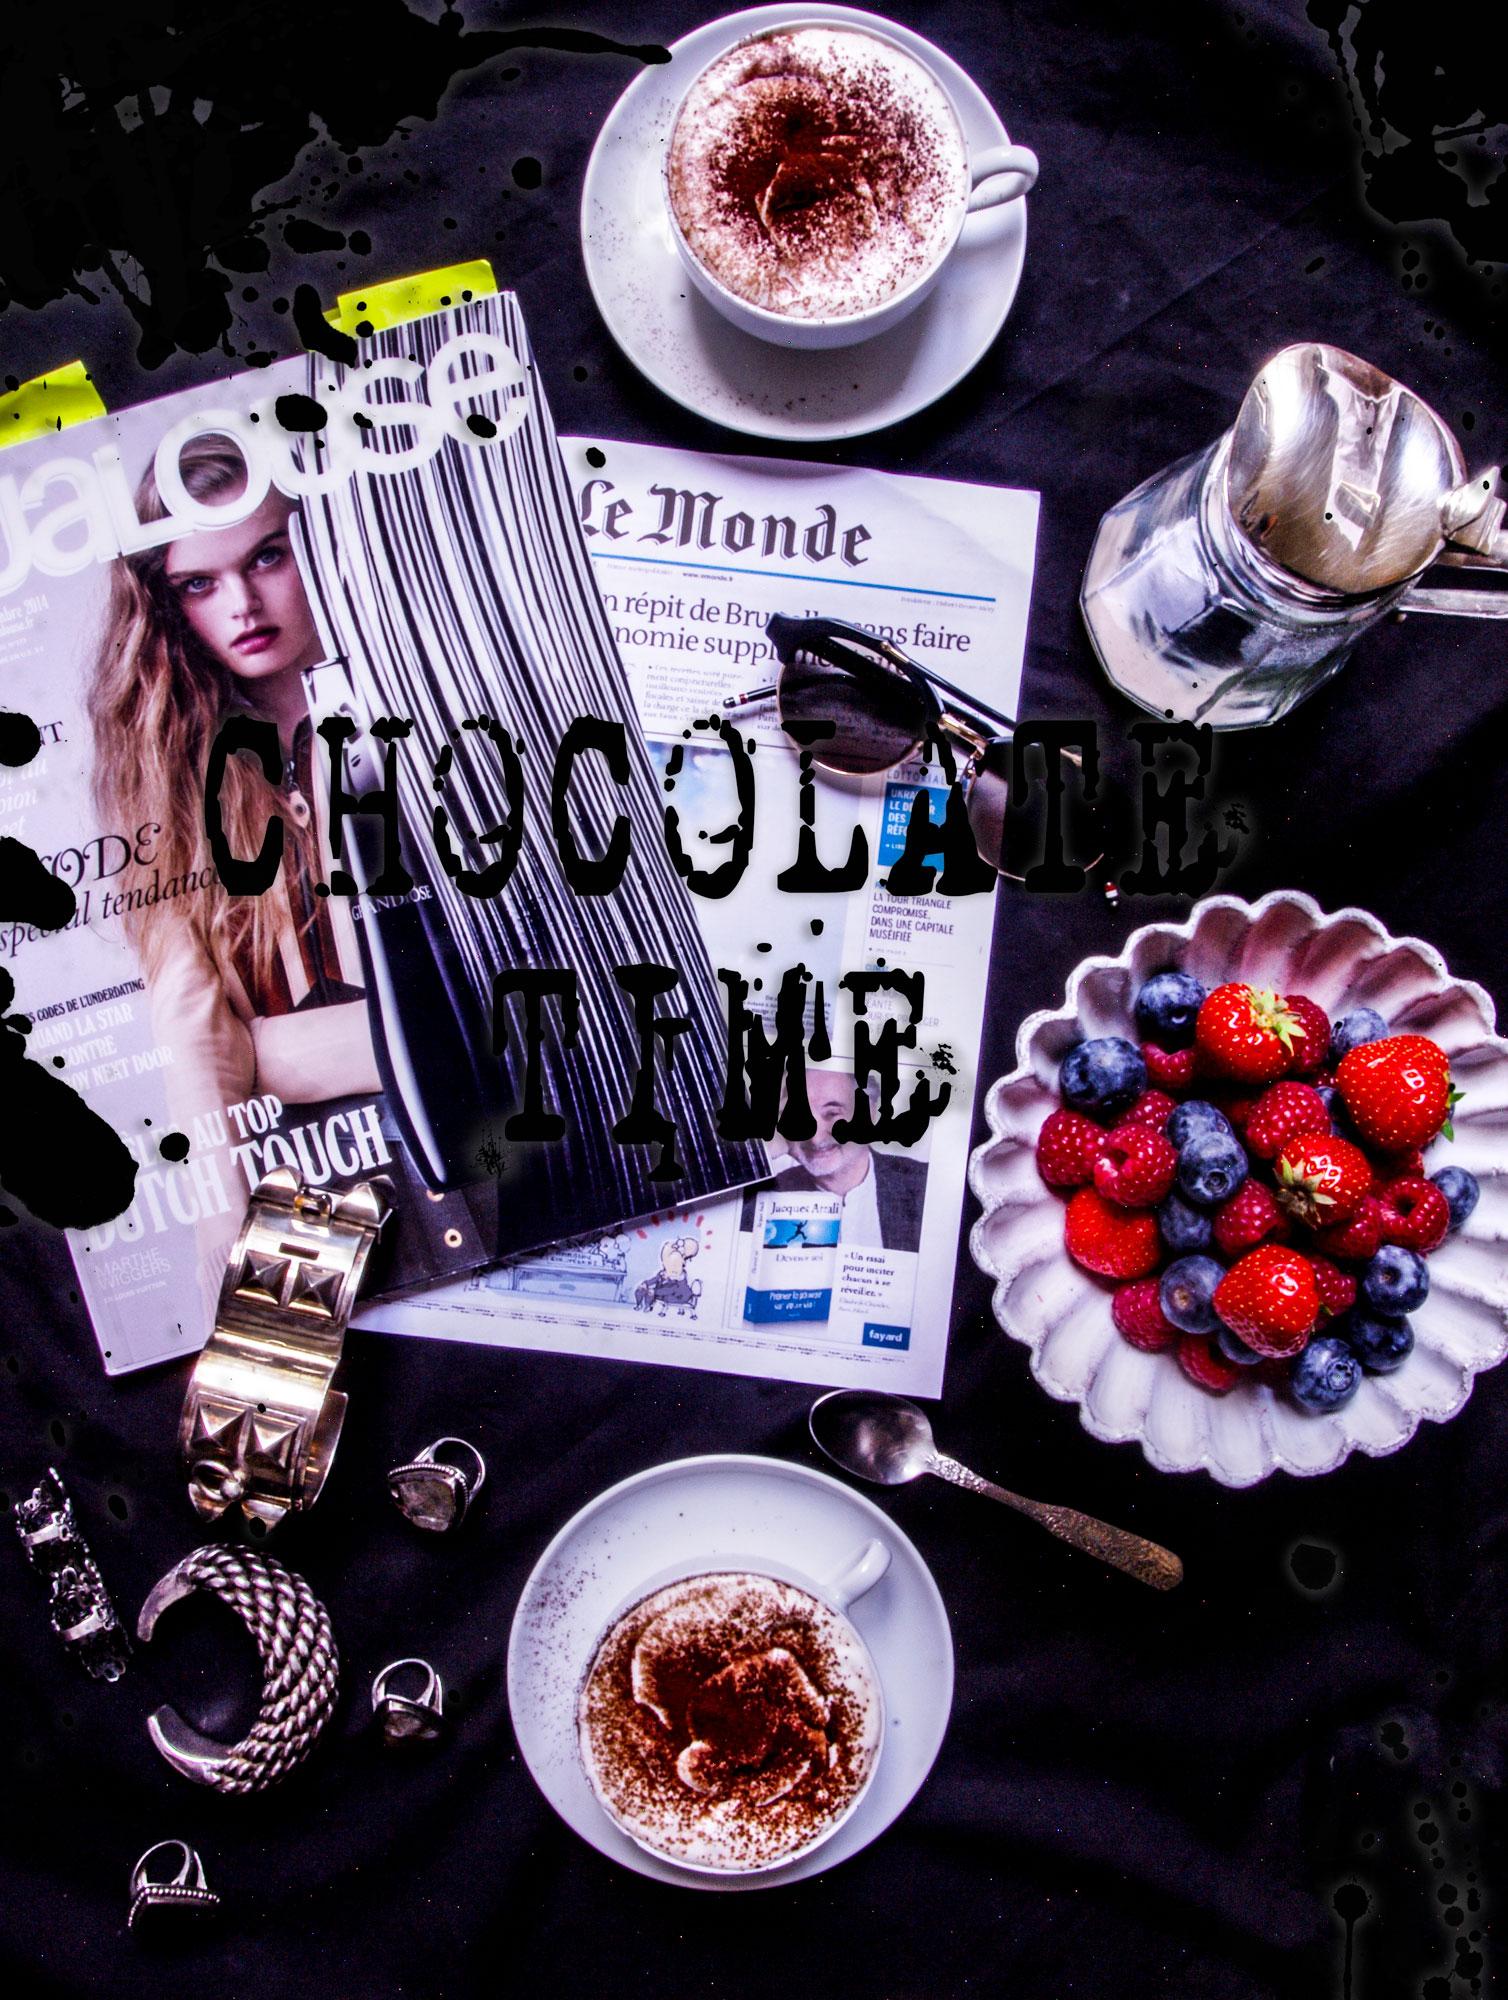 dessert, praliné, pralin , noisette, chocolat, easy, recette, recipe, blogger, chocolate, hazelnut, almond, sweet,chef, blogger, cooking, cake , leger , gateau , light, chabath , shabath , parvé, dairyfree, sans lactoses , bread, homemade, freshly baked, recipe, pain , pain de mie, loaf, MAP, recette, blog, blogger, donut, beignet, hannouca, doughnut, hanouka, sucre, chocolate mousse, creamy, foamy, light, fluffy, airy, chocolate, sweet, vegan, recipe, light, healthy, gluten free, chocolat, recite, kosher, kasher, cacher, dessert, sucré, facile, rapide, quick, easy, boisson ,lait, chocolat chaud, hot chocolate